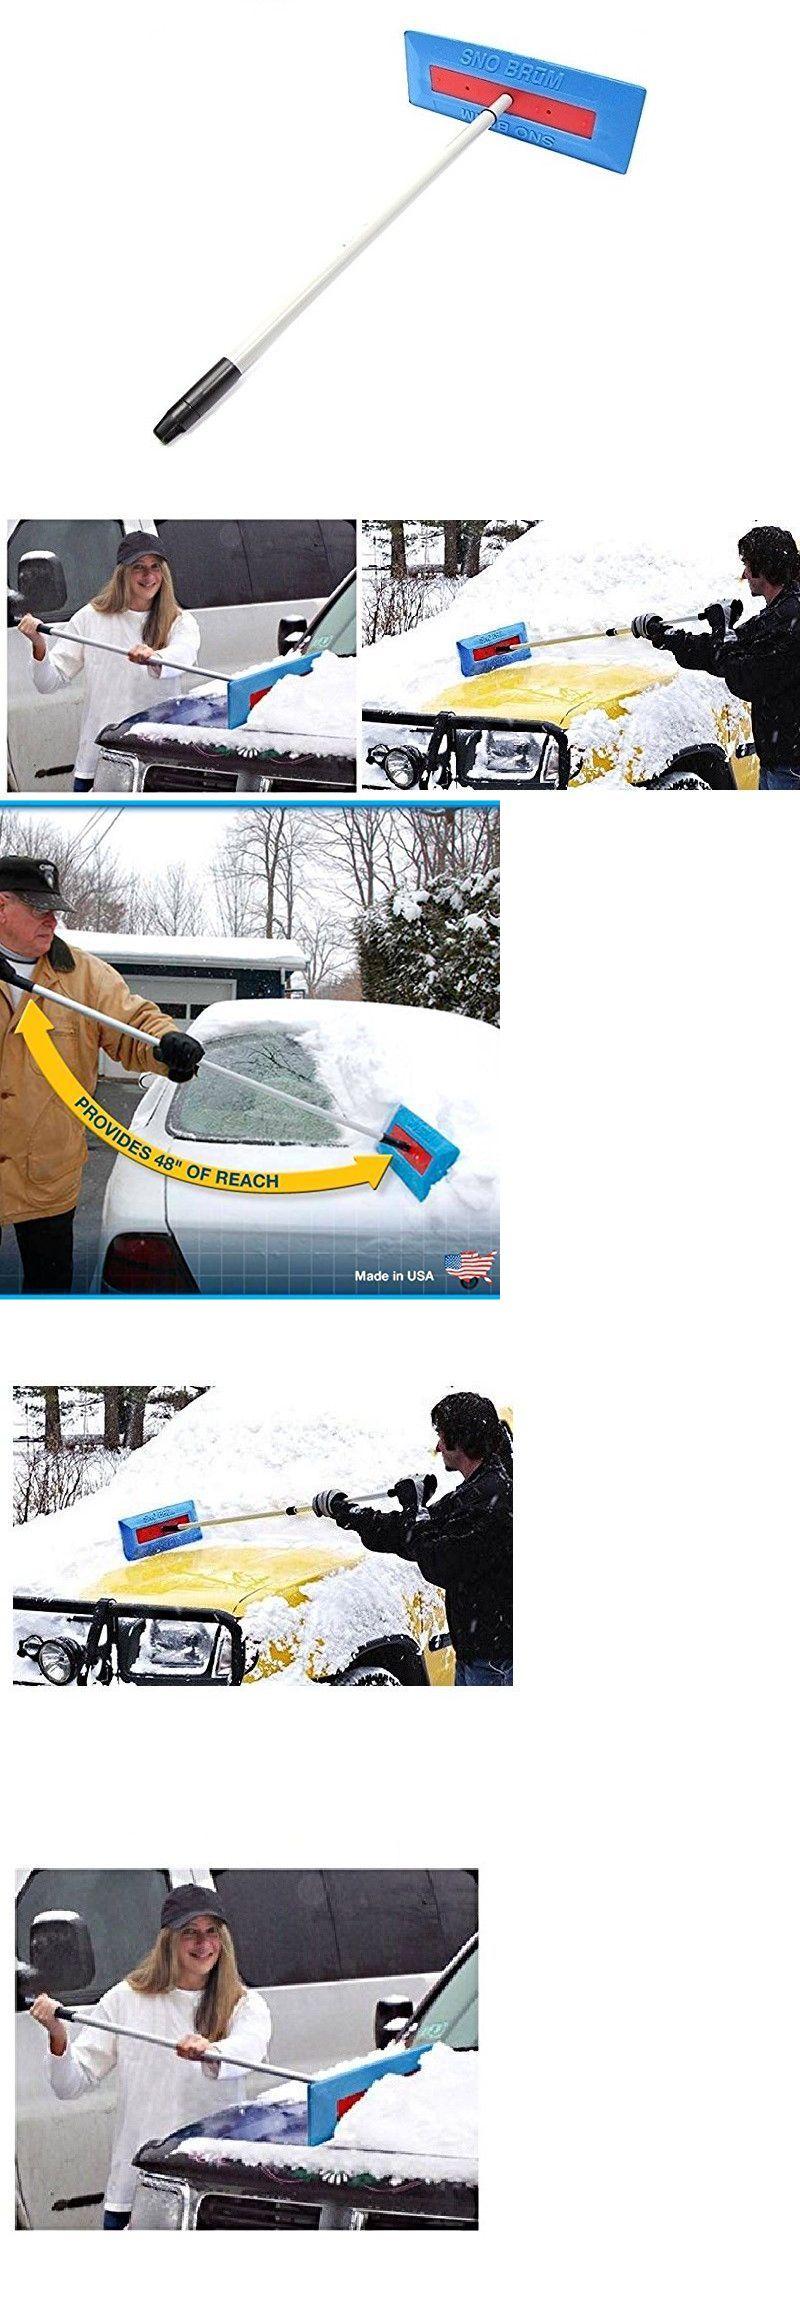 Rakes 118864 Lightweight Roof Rake Snow Removal Tool For